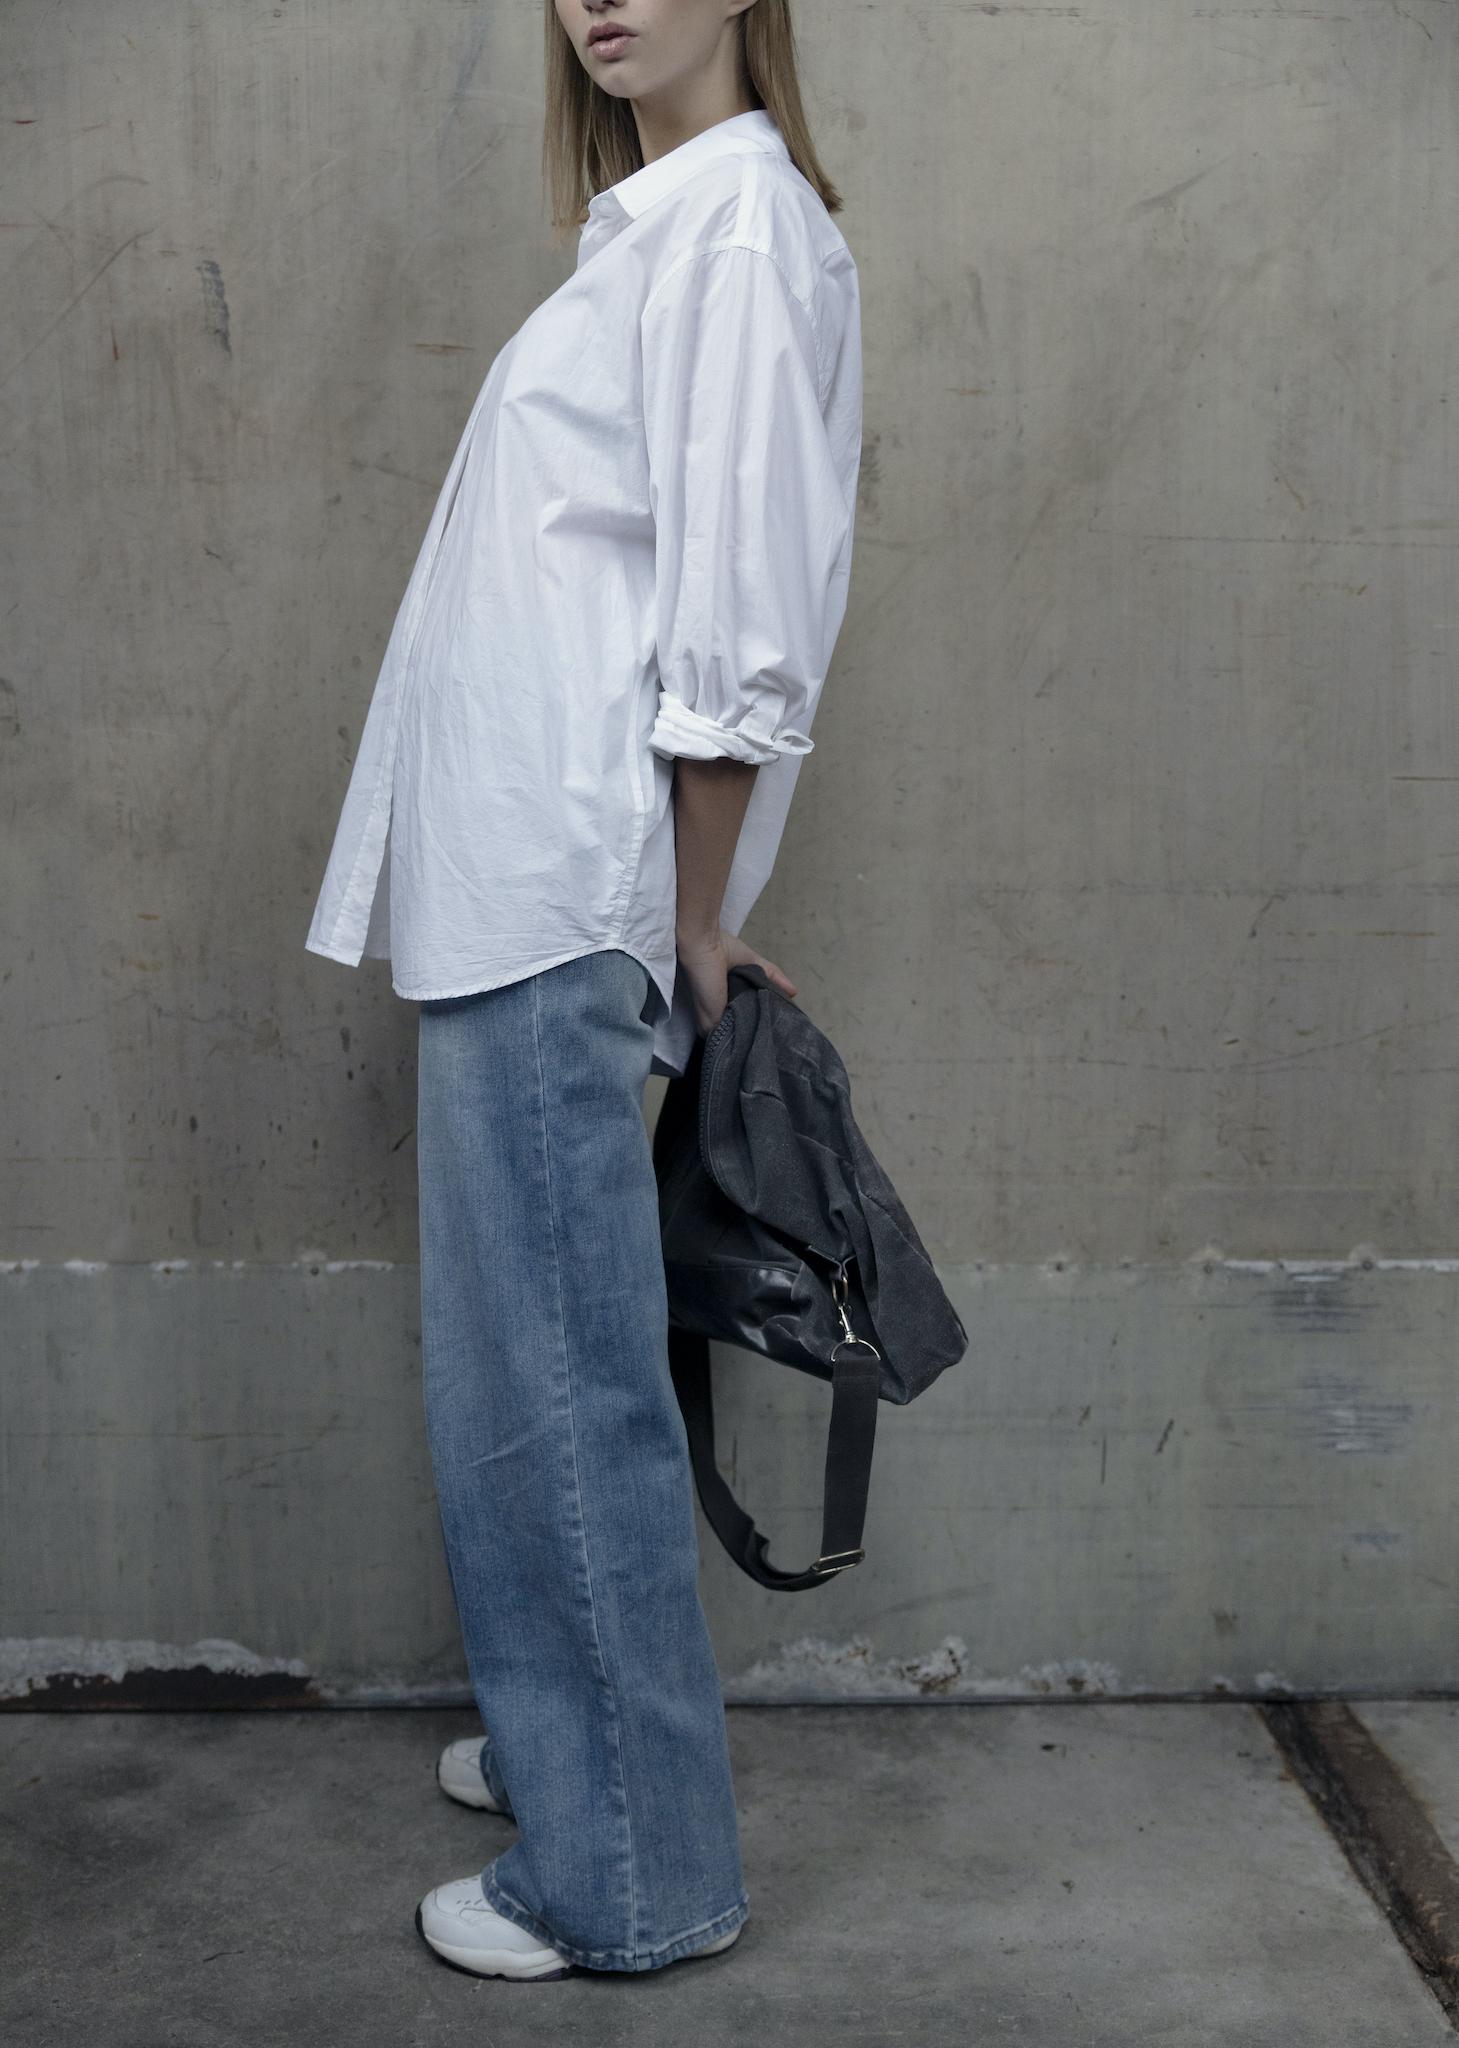 I dig denim - Nanna Poplin Shirt - white